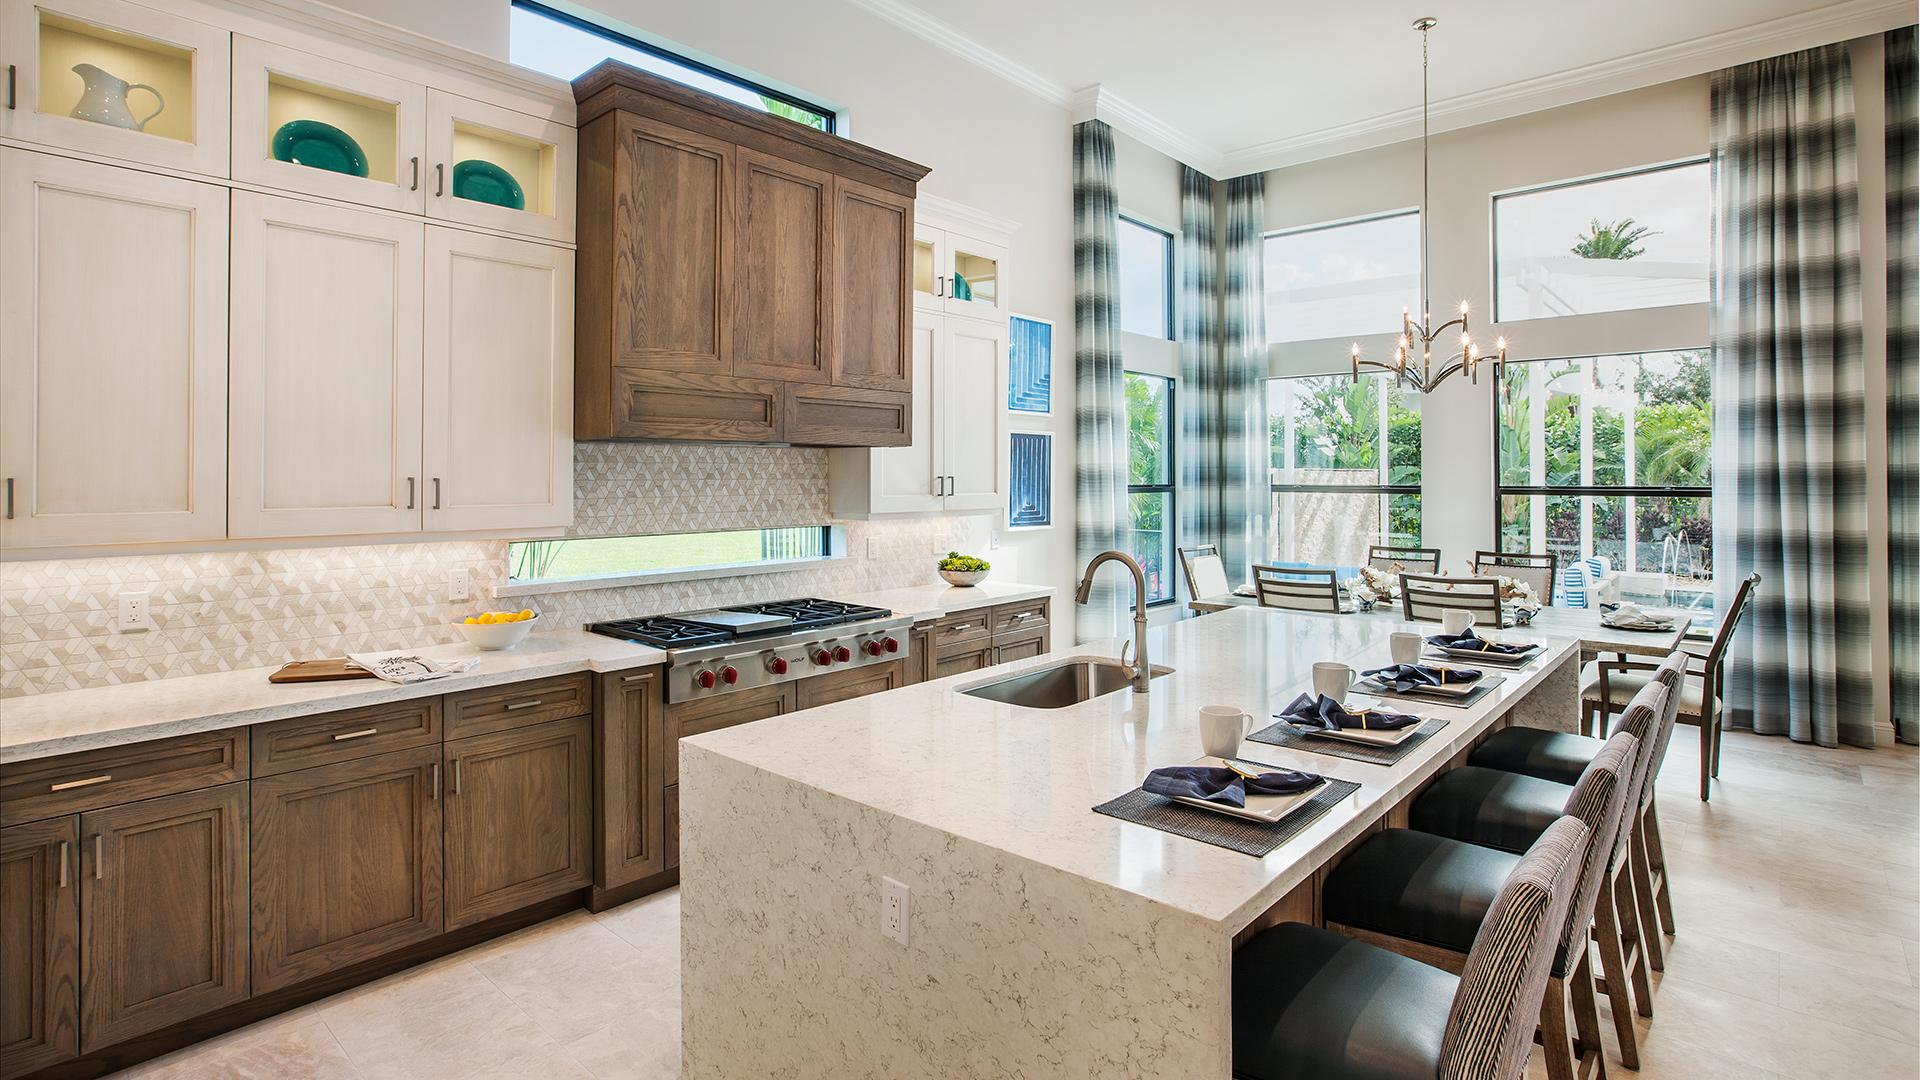 Gourmet kitchens with abundant storage